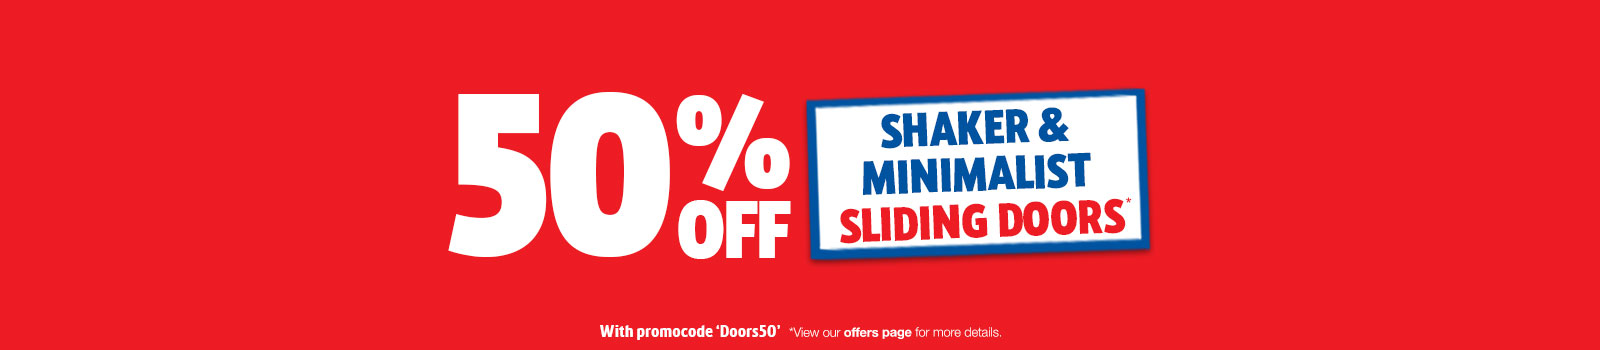 50% off shaker and minimalist